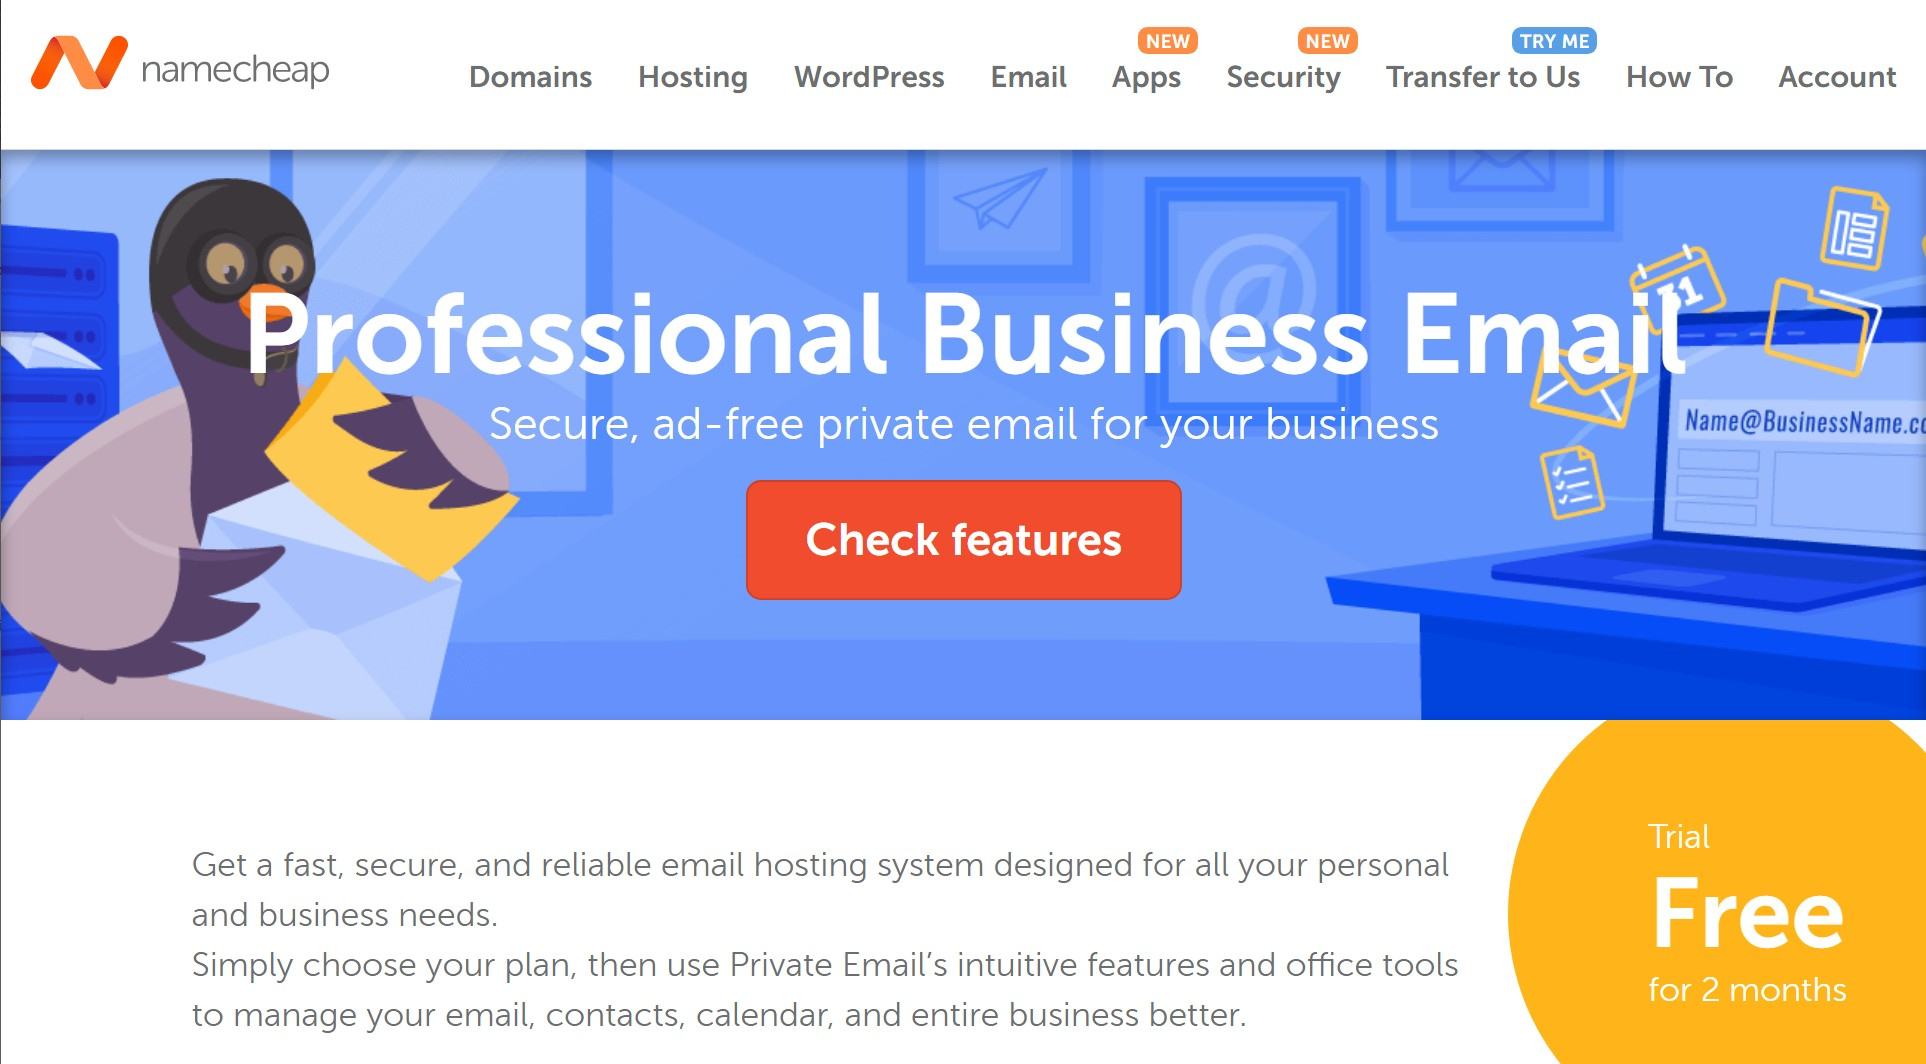 Namecheap has very cheap email hosting